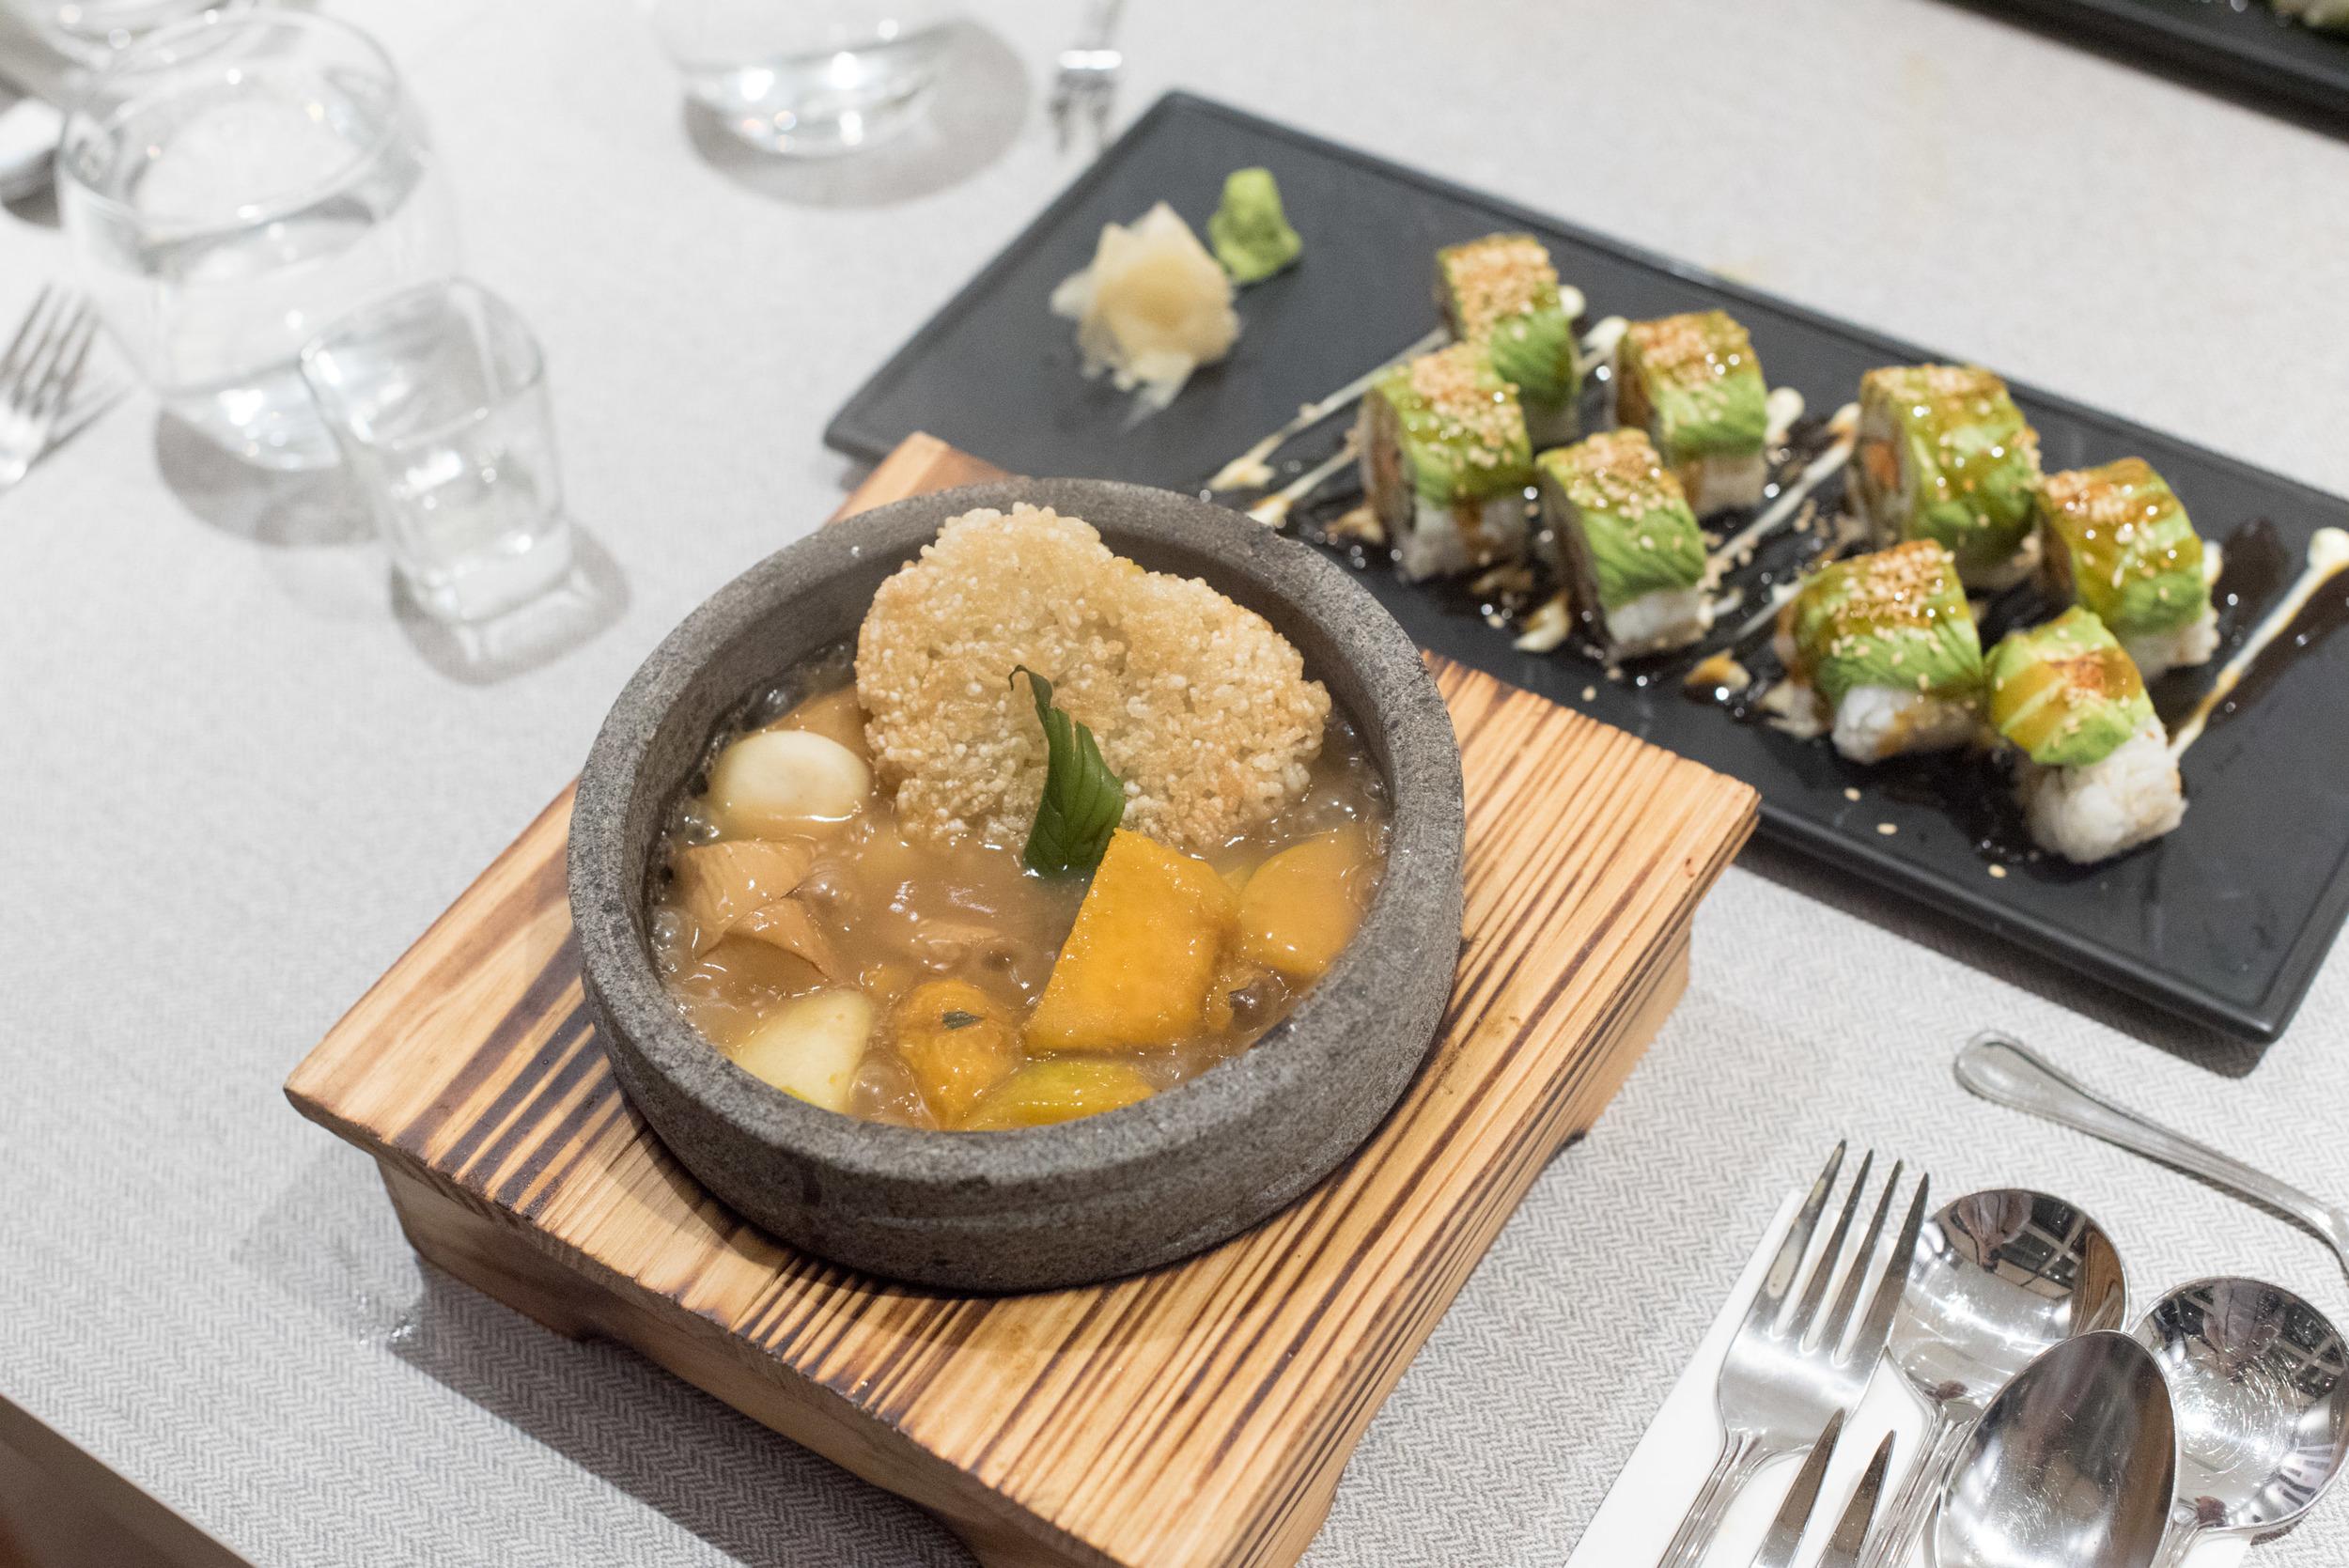 Braised Golden-brown Pumpkin with Glutinous Rice in Hot Stone